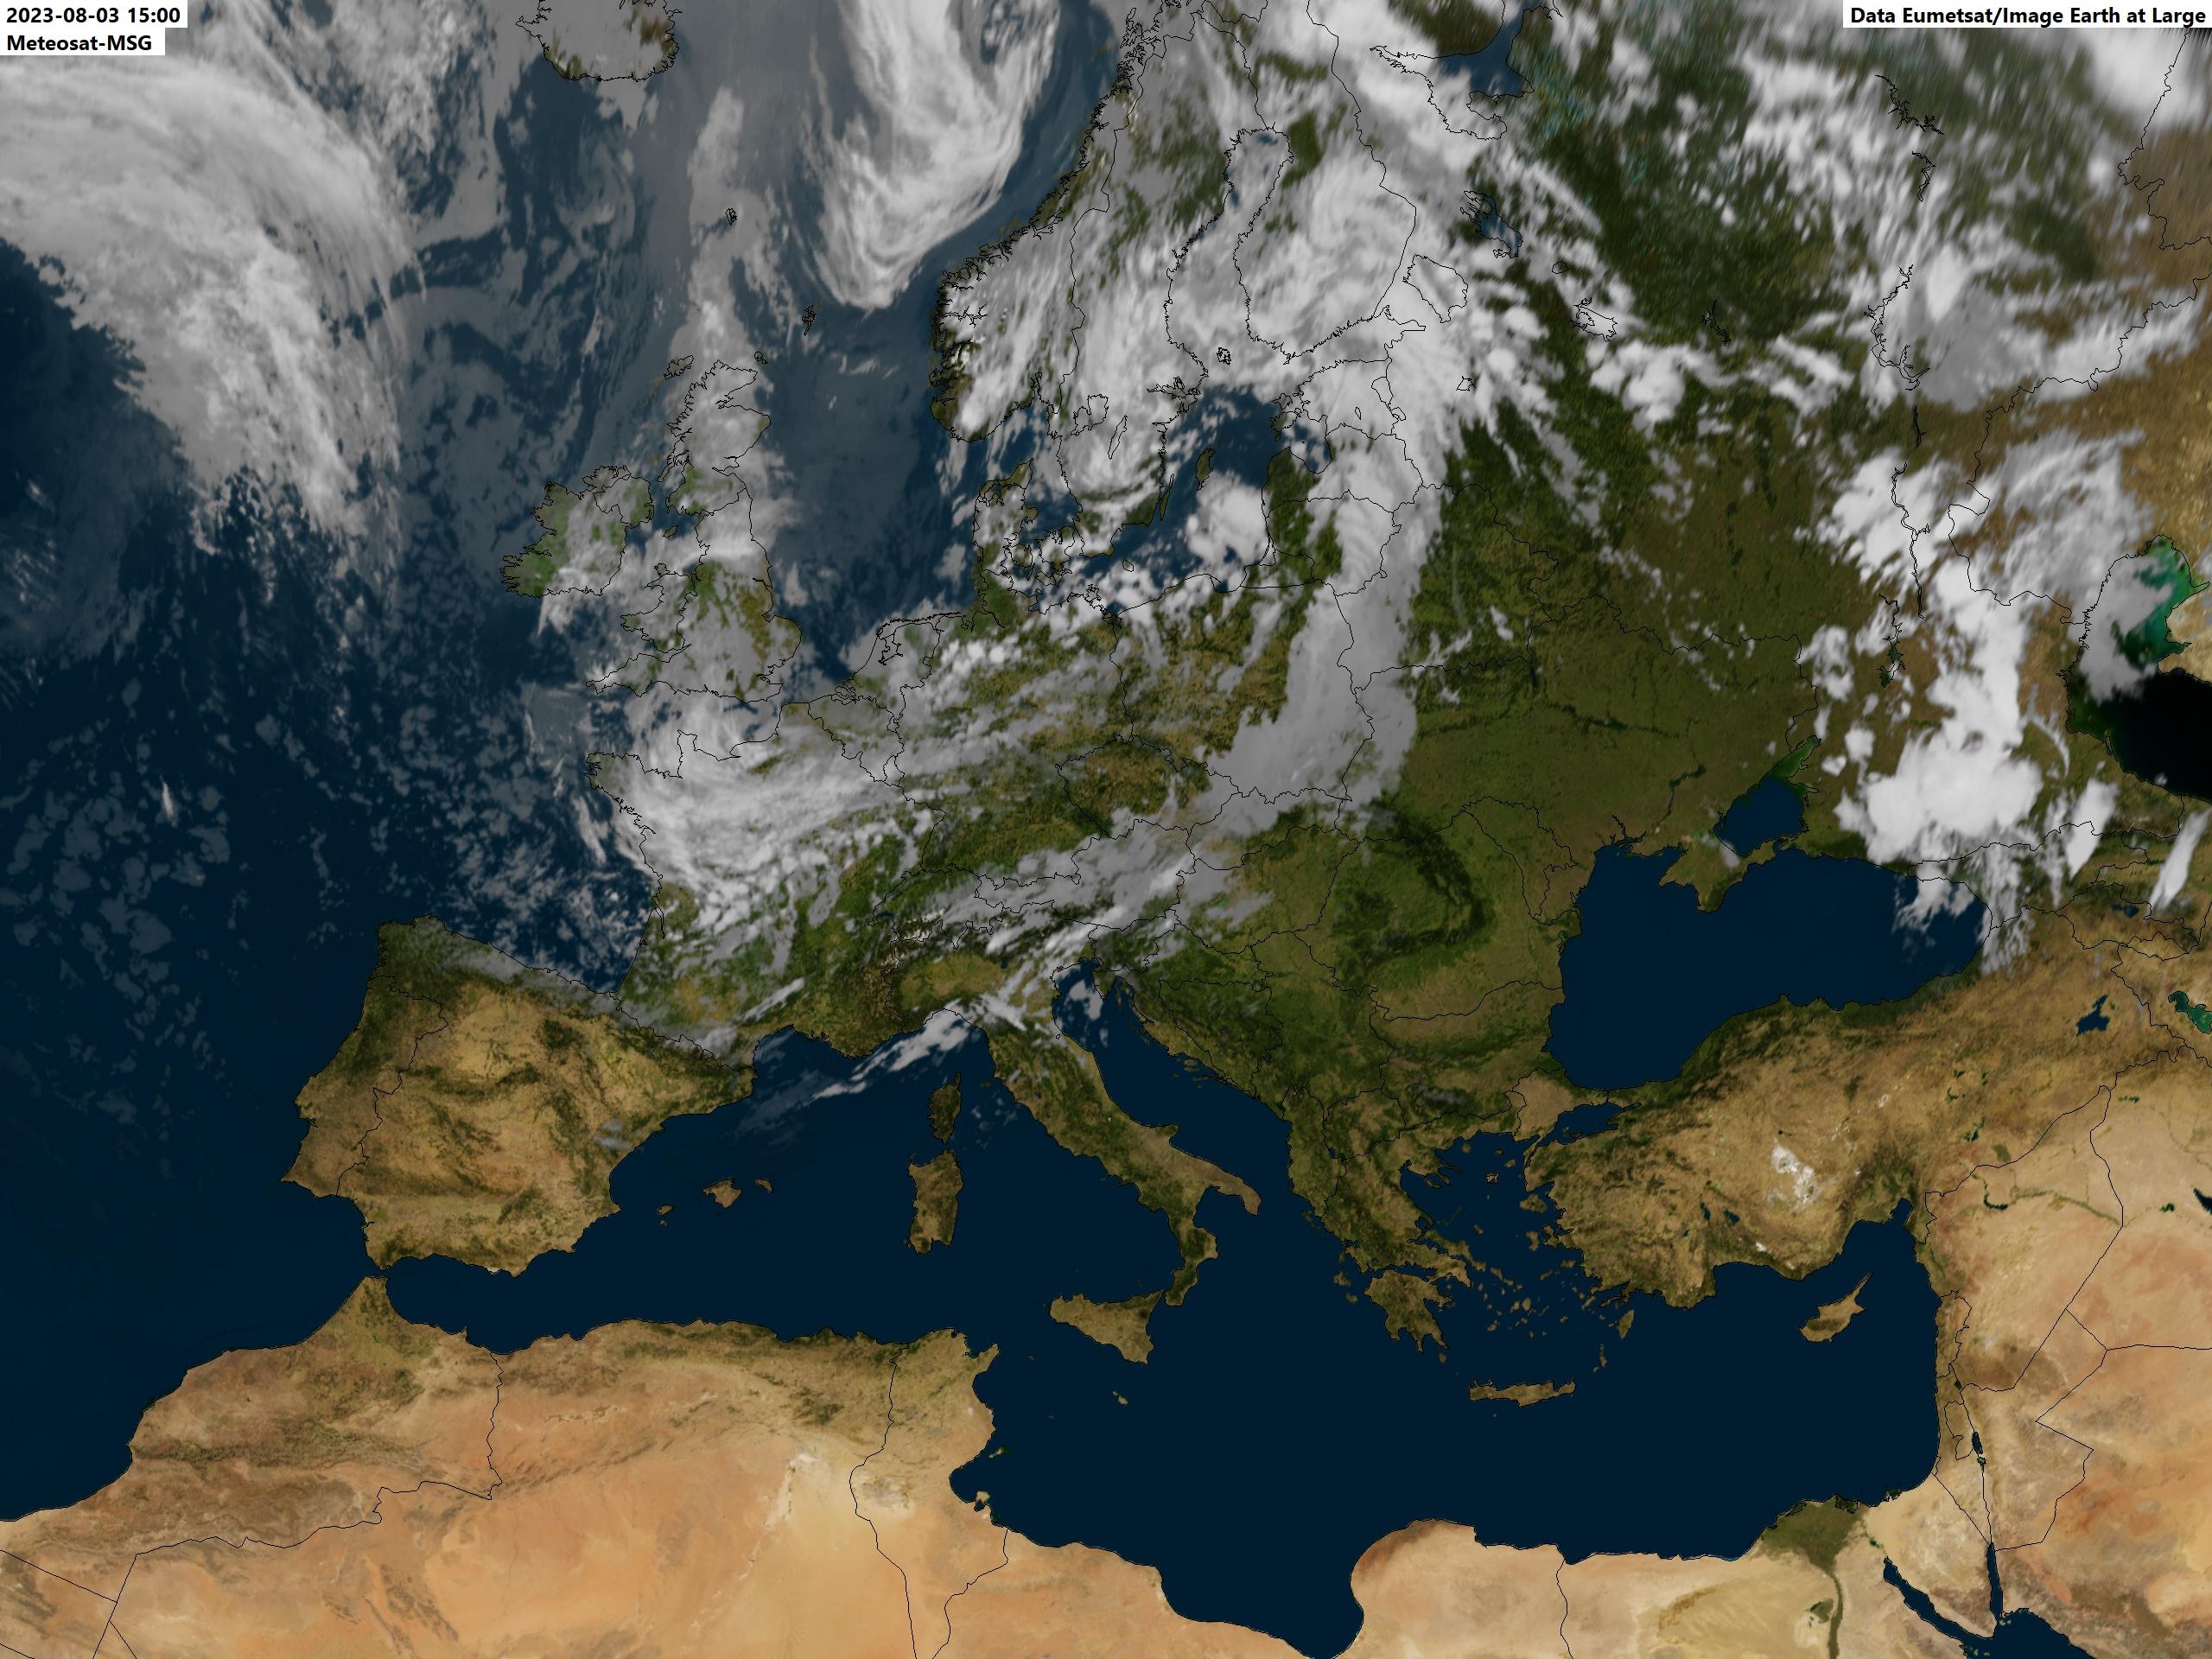 Image meteo du jour Europe